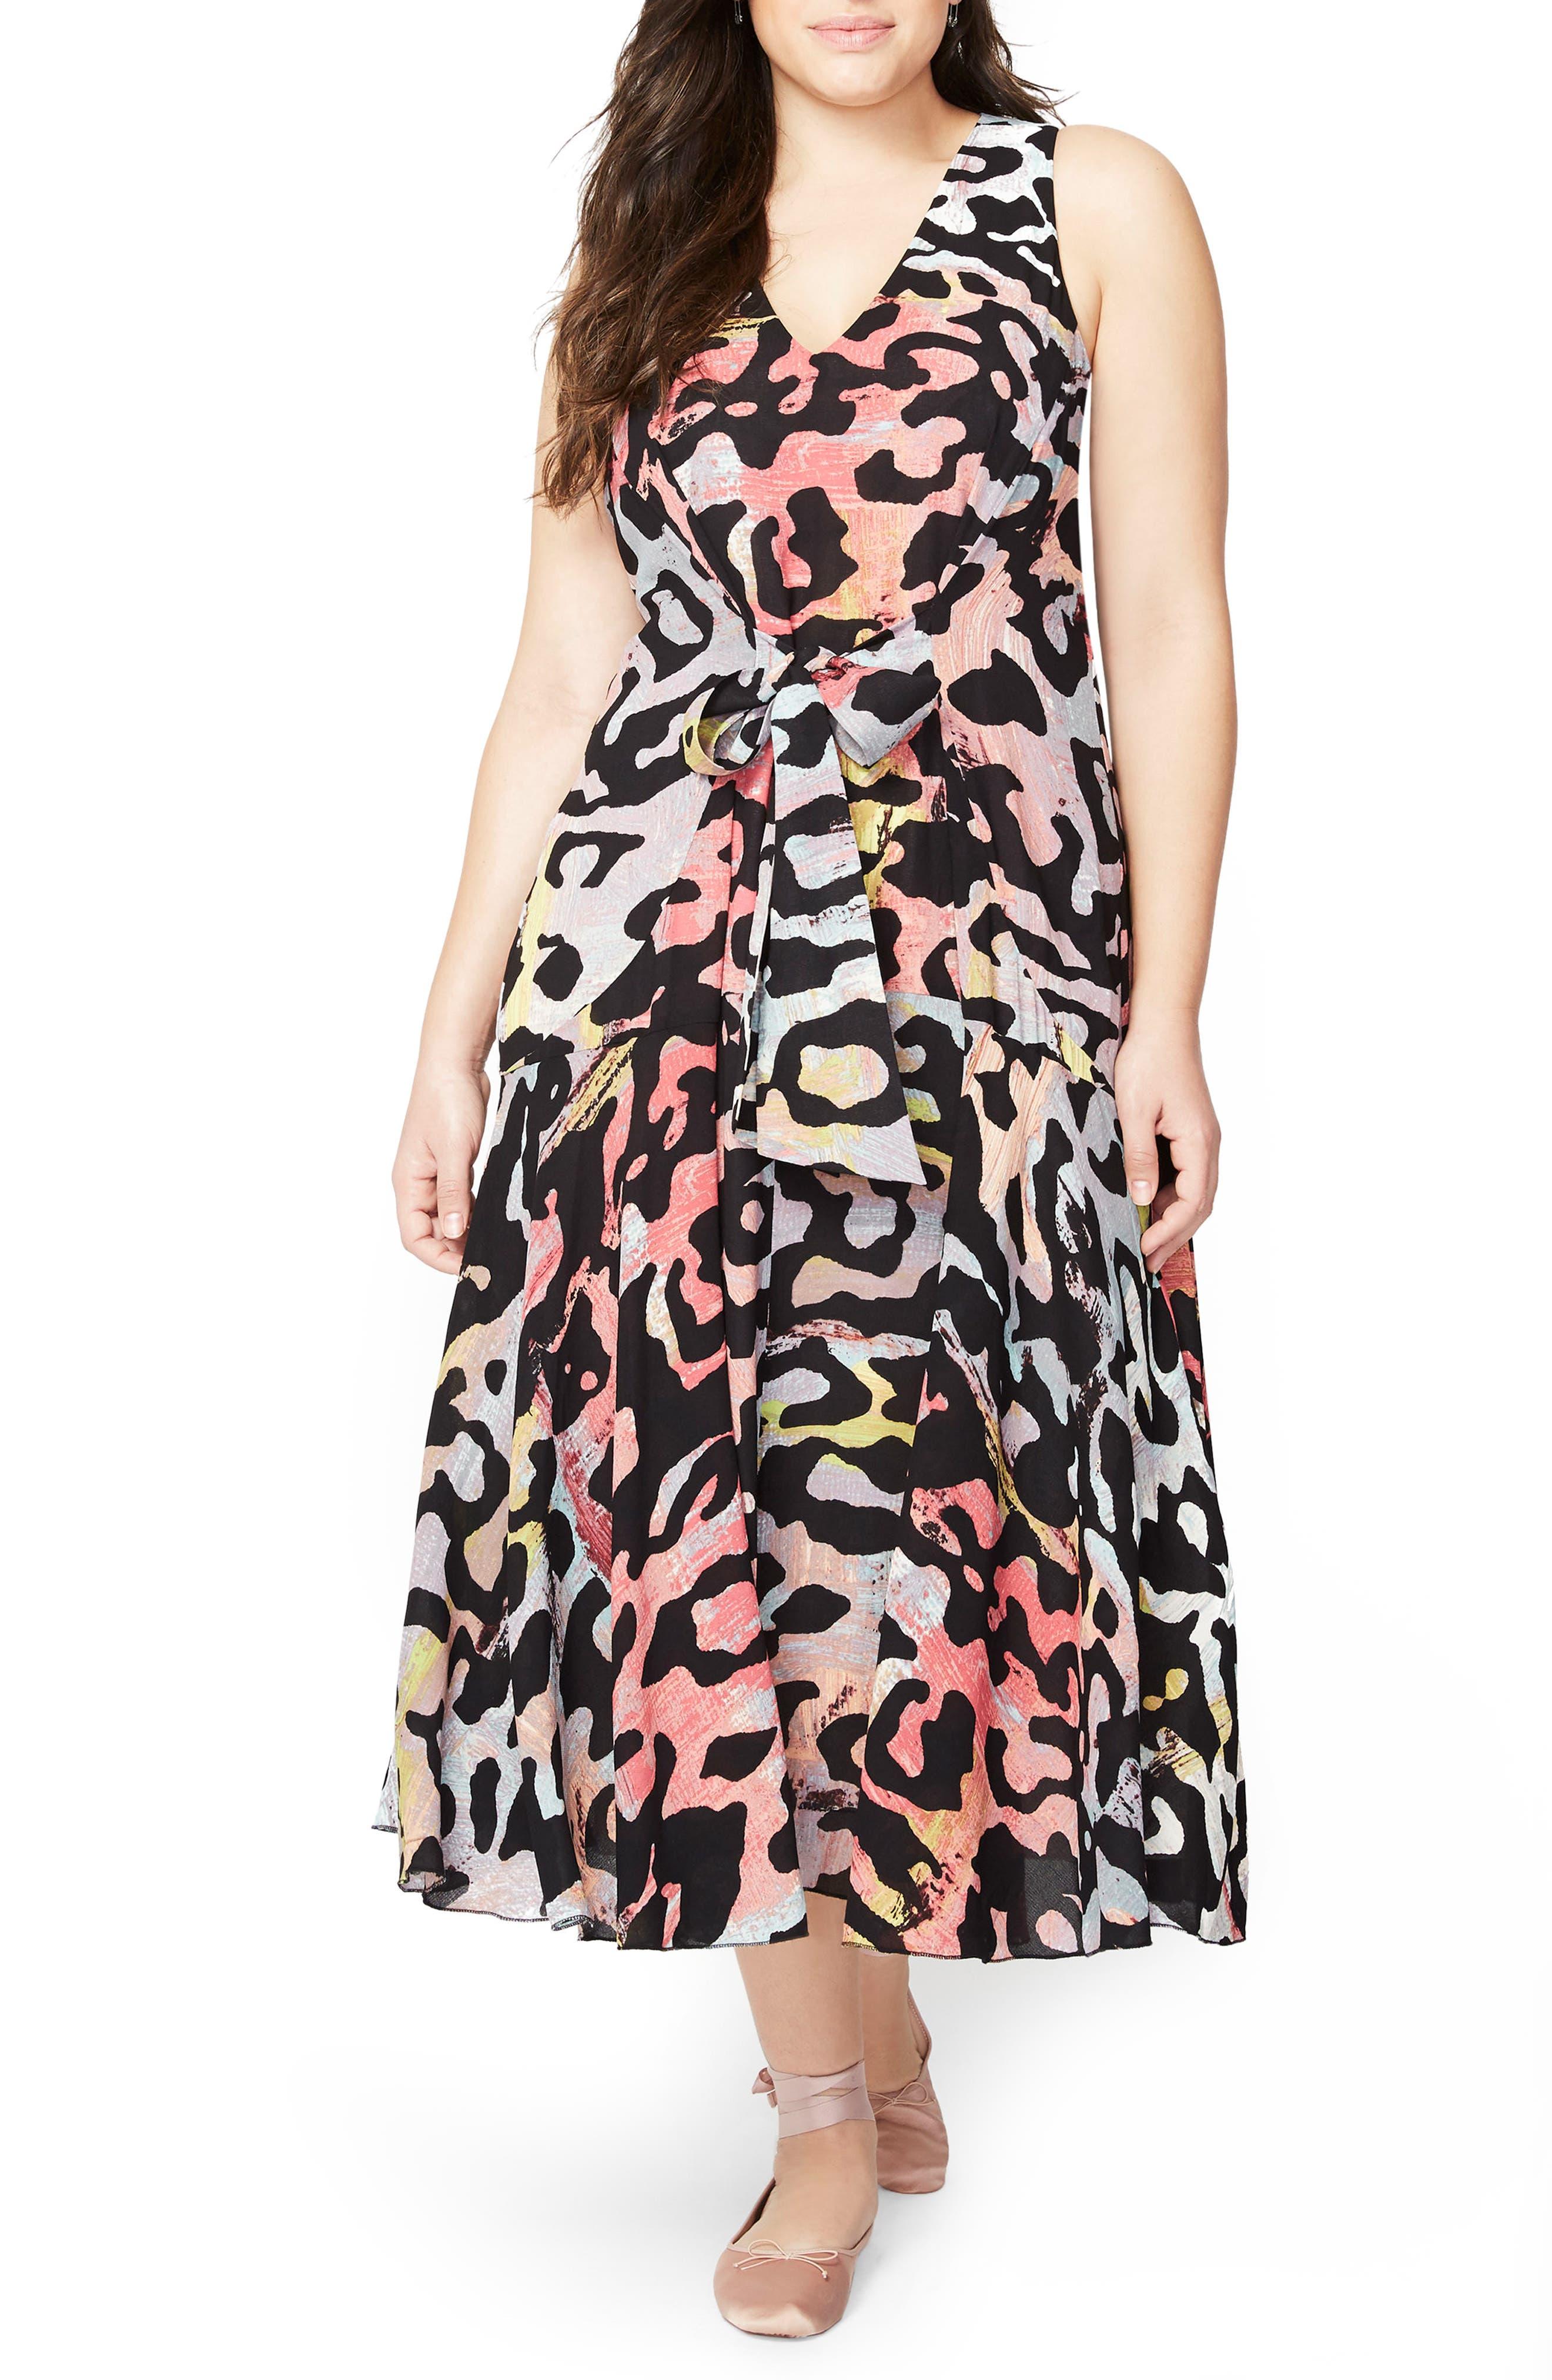 Alternate Image 1 Selected - RACHEL Rachel Roy Tie Front Midi Dress (Plus Size)